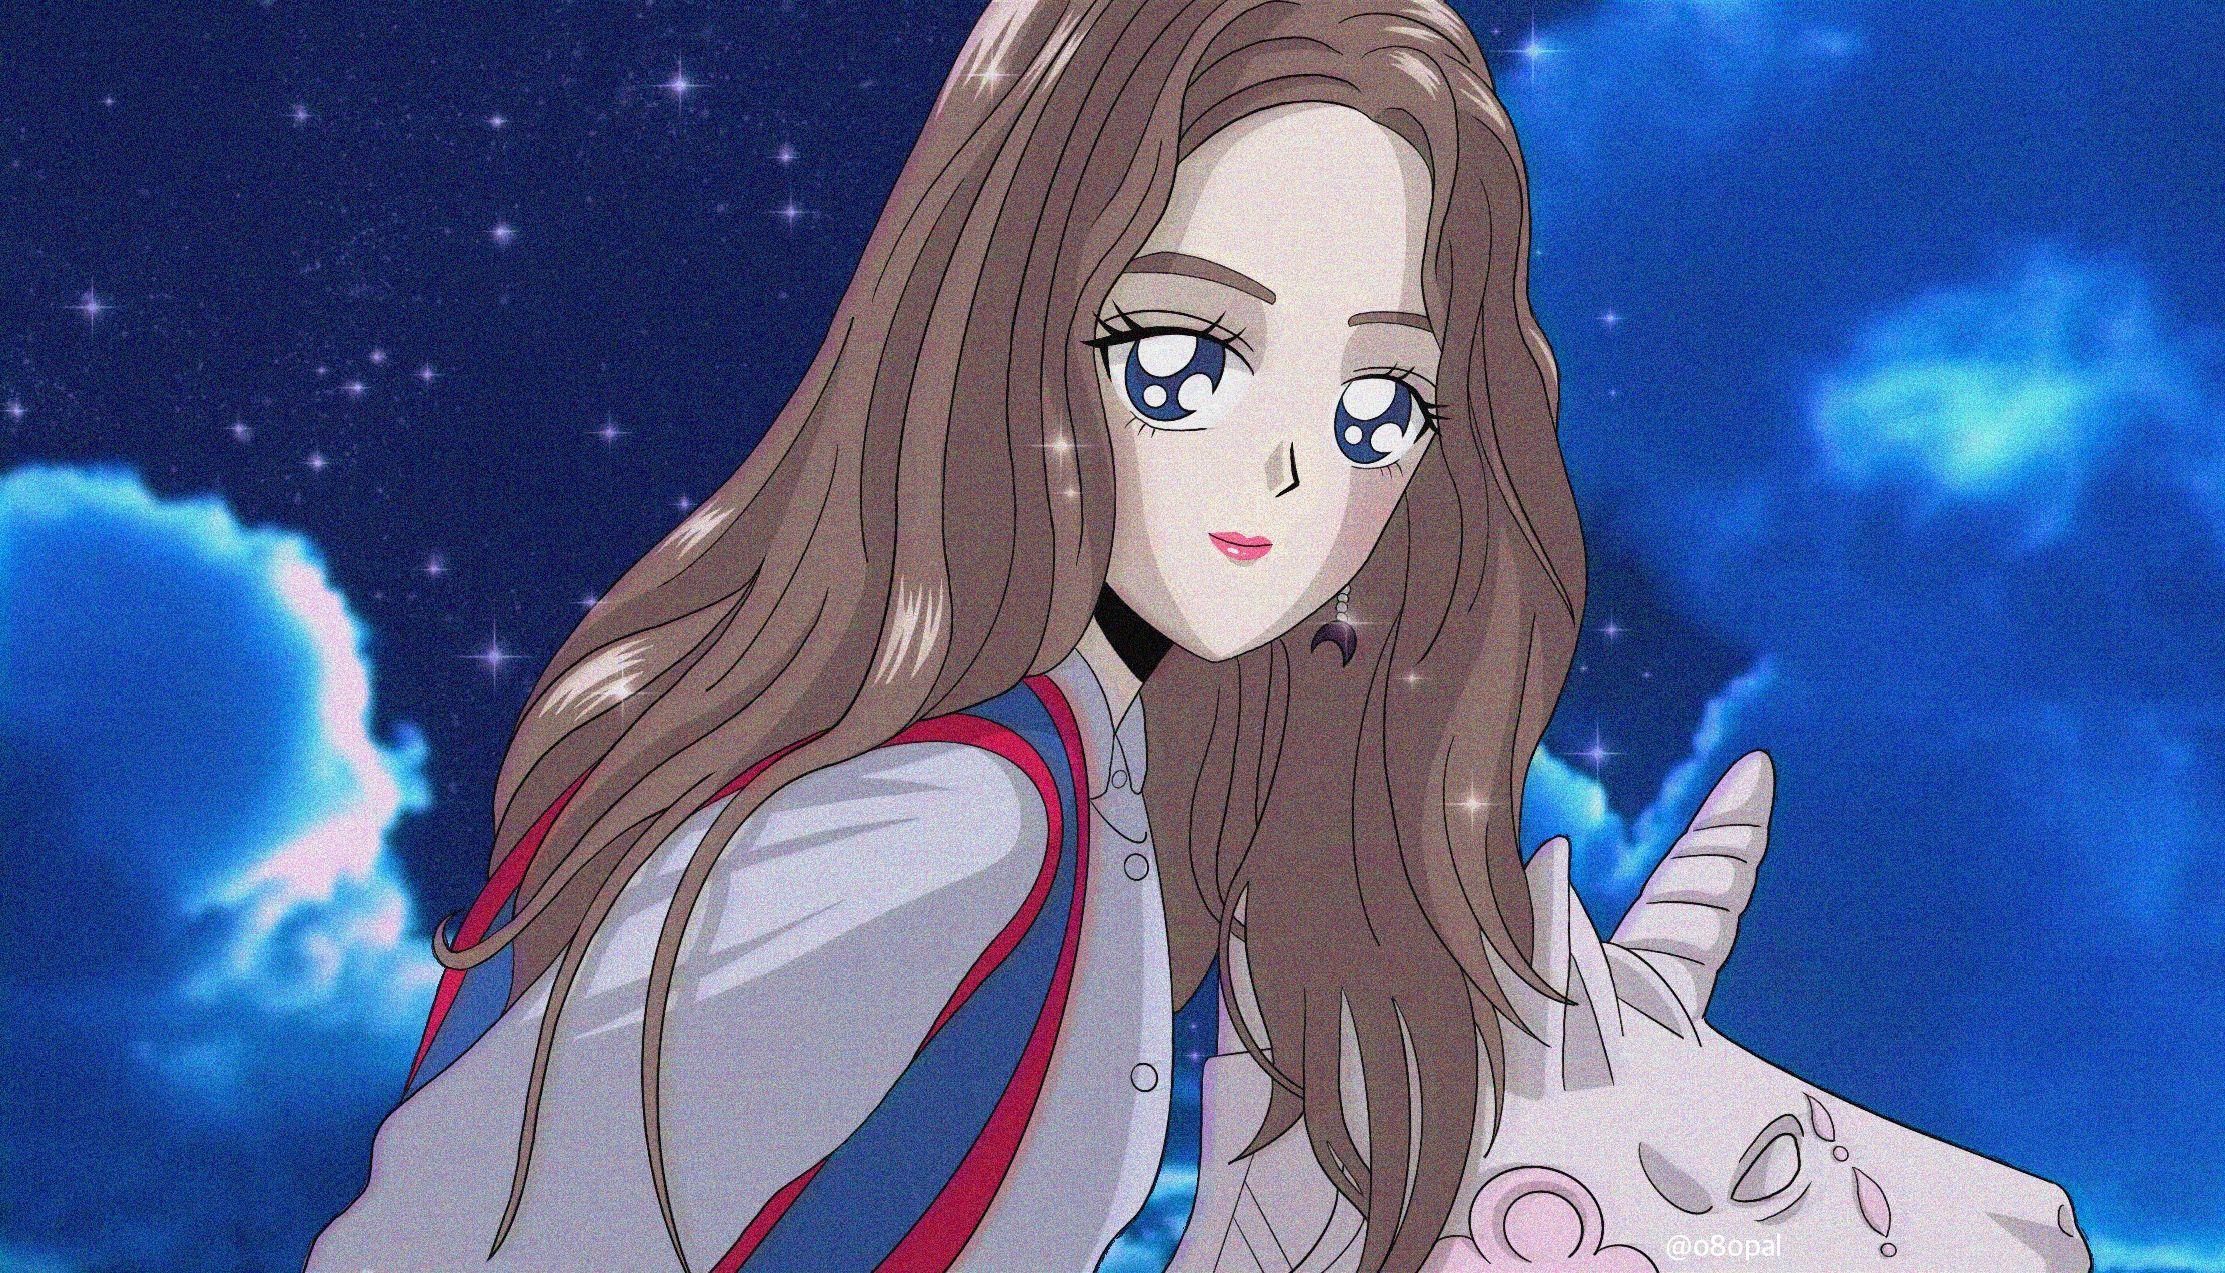 Redvelvet as 90s anime redvelvet zimzalabim 레드벨벳 짐살라빔